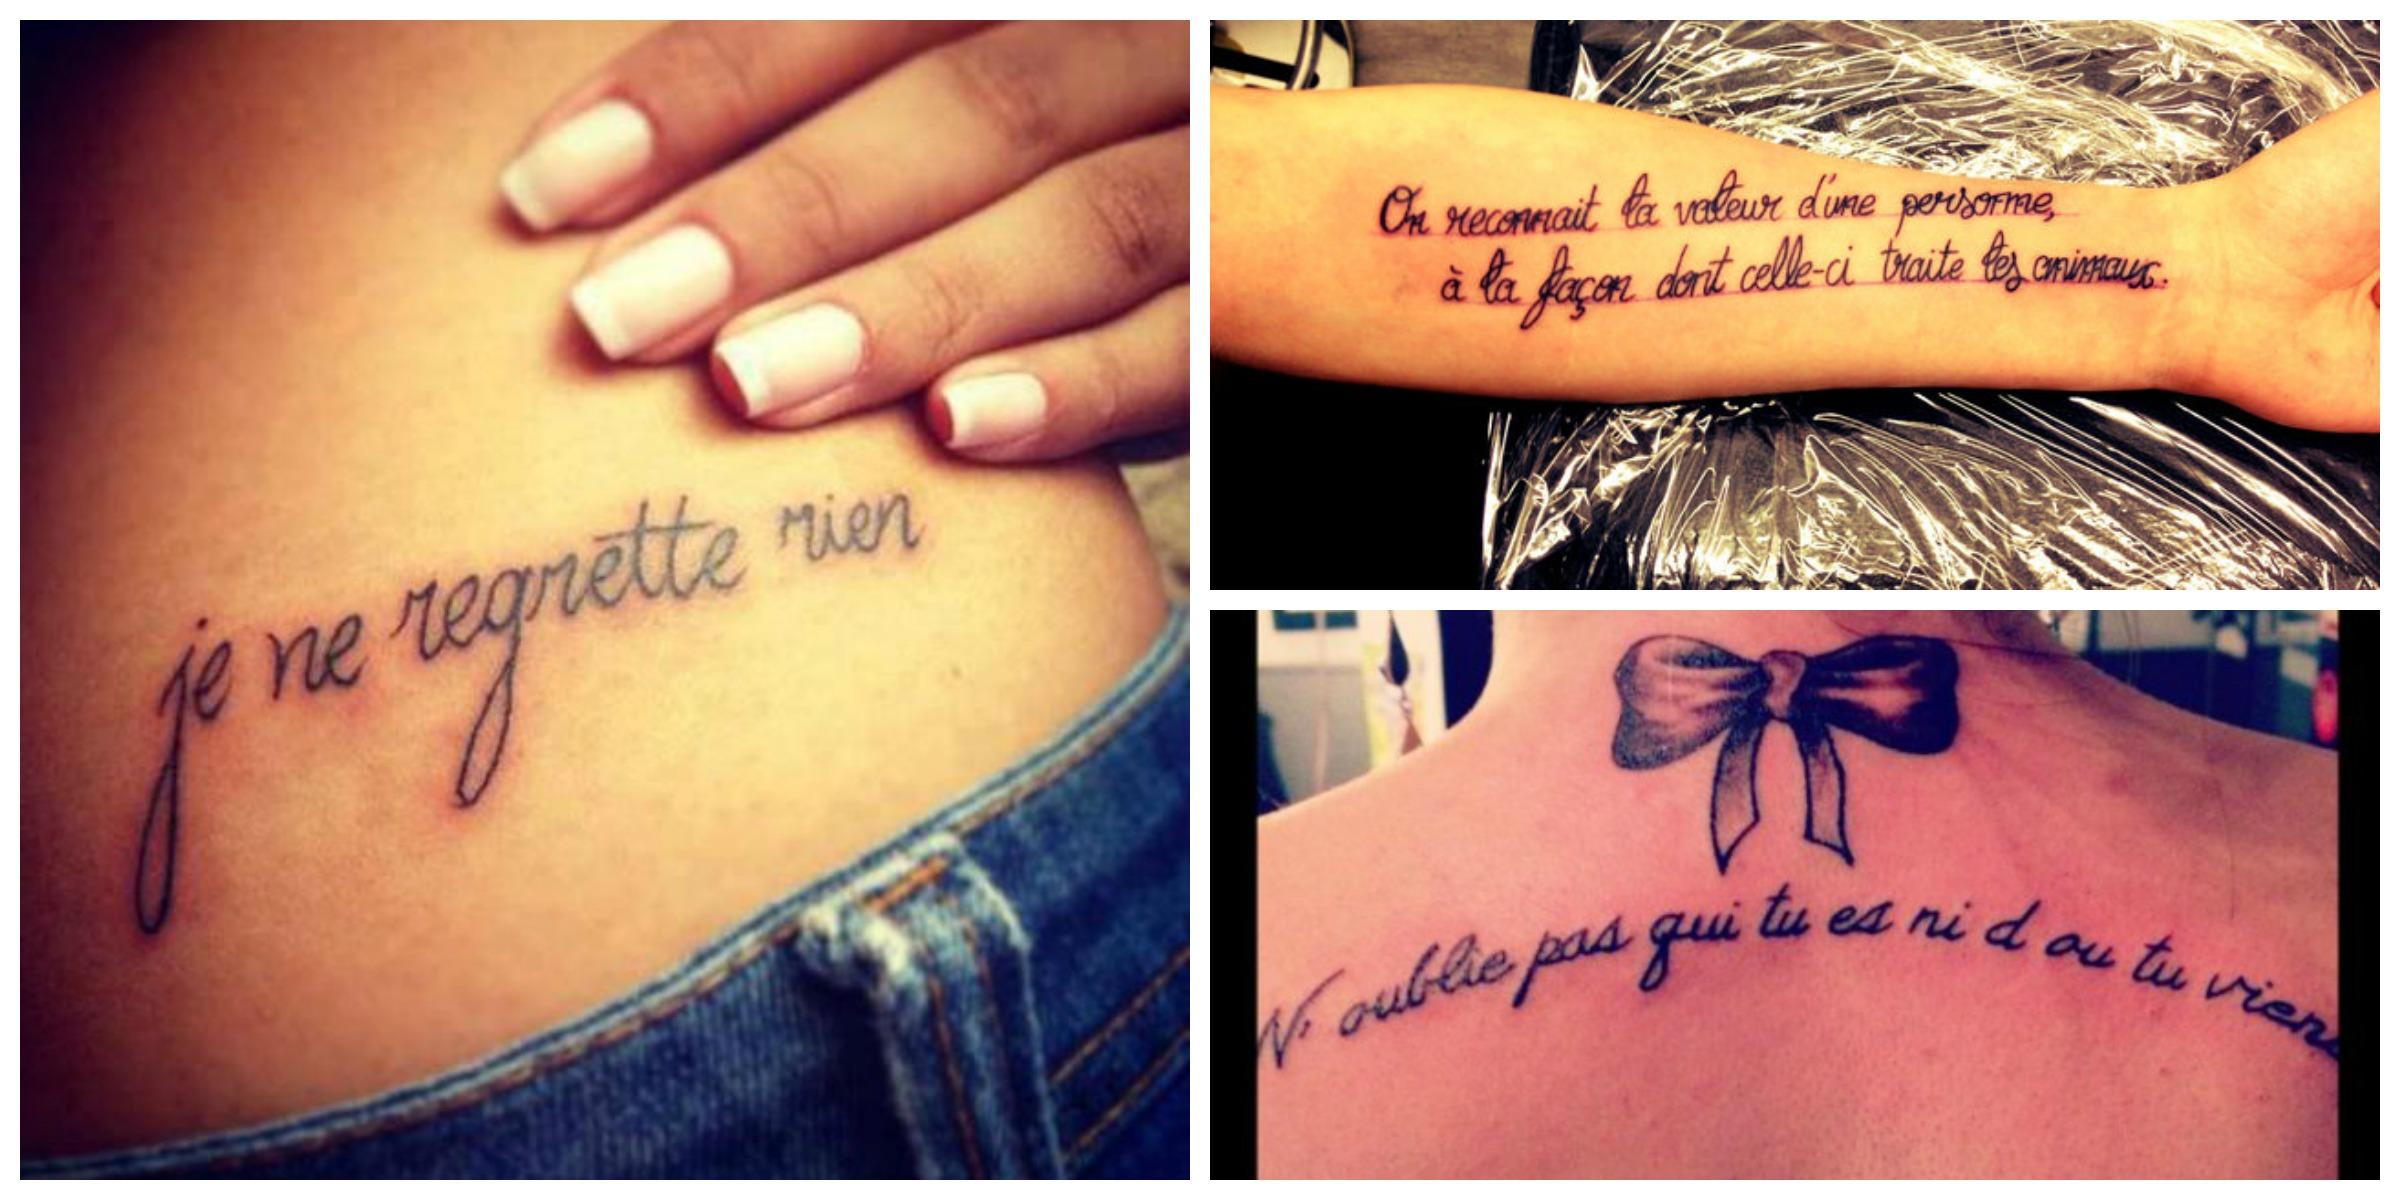 Tatouage phrase francaise femme